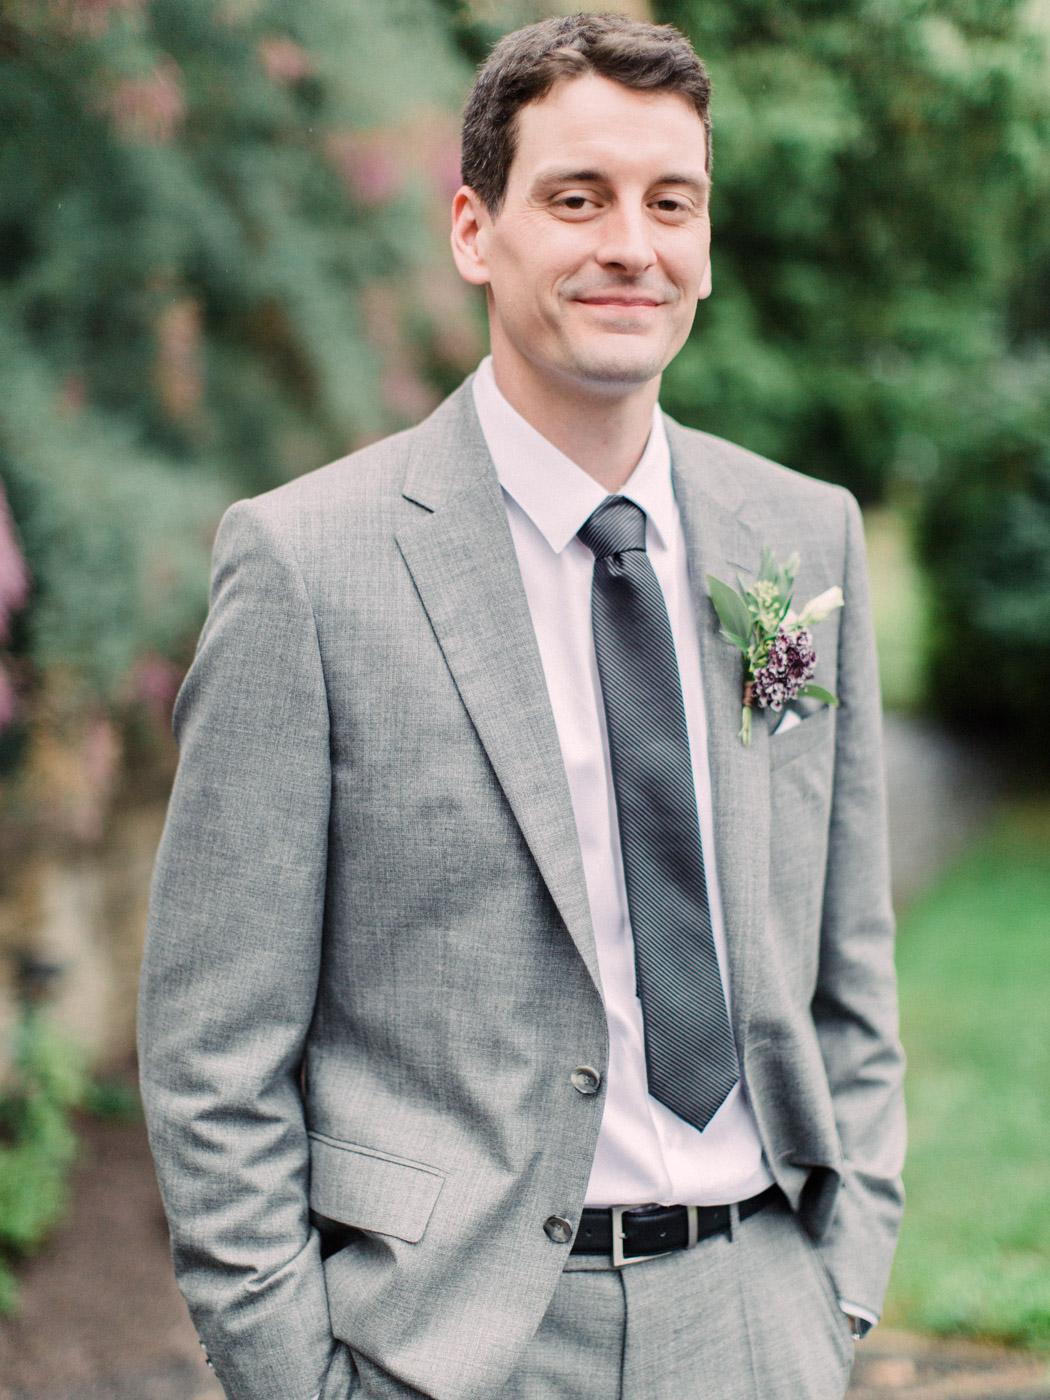 Toronto-wedding-photographer-intimate-classic-fine-art-elopement-ottawa49.jpg